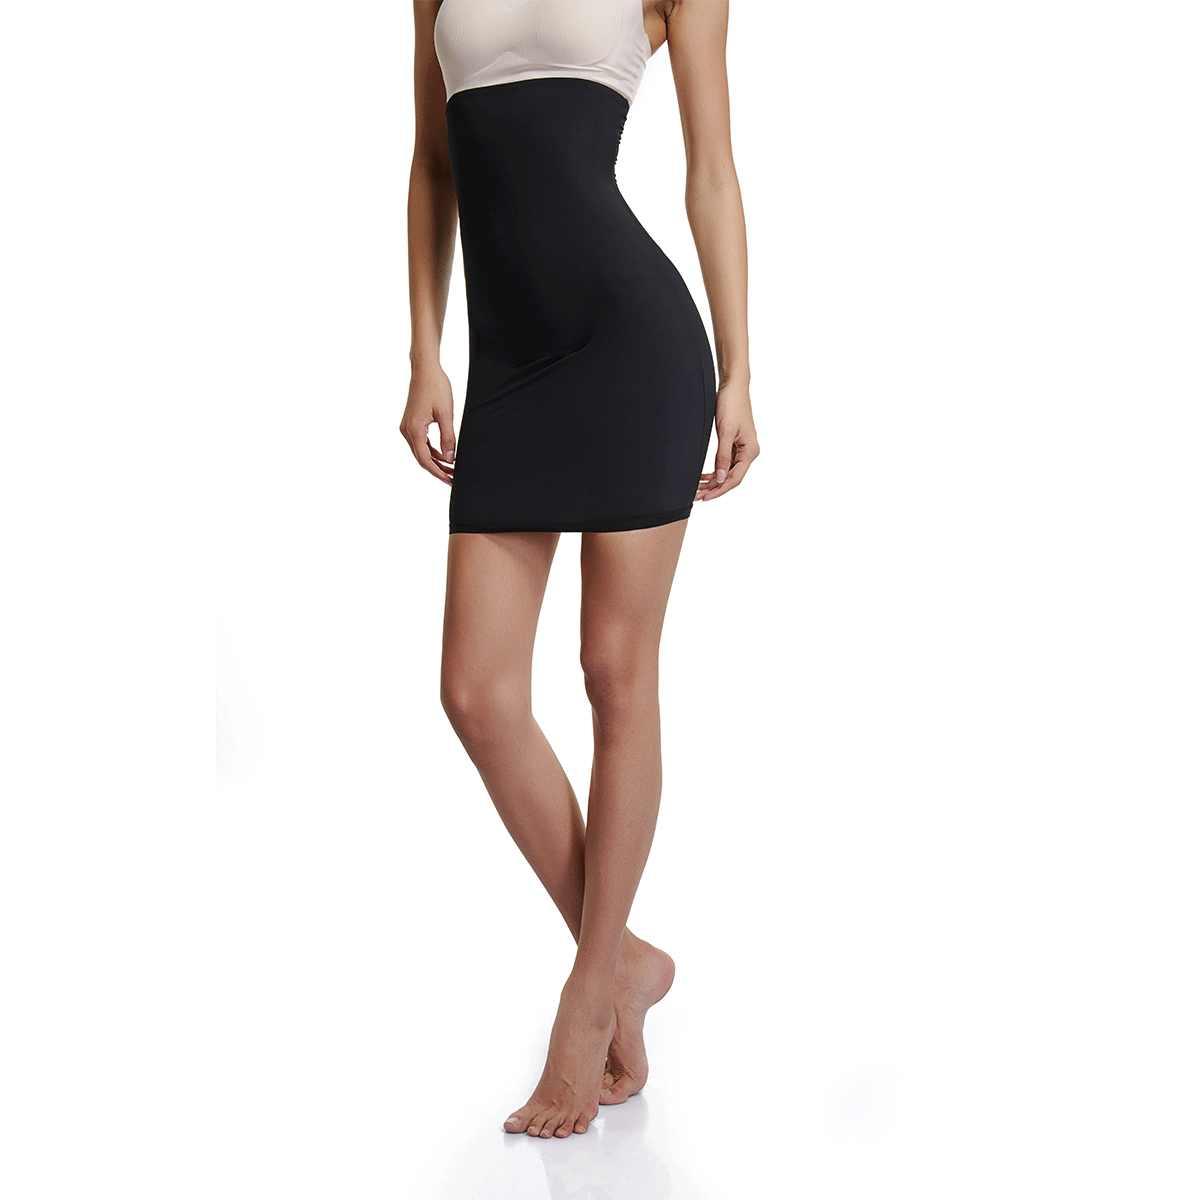 Women Shapers Half Slip Control Dress Slimming Underwear Skirts High Waist  Shapewear Butt Lift Tummy Control Underskirt S 3XL| | - AliExpress